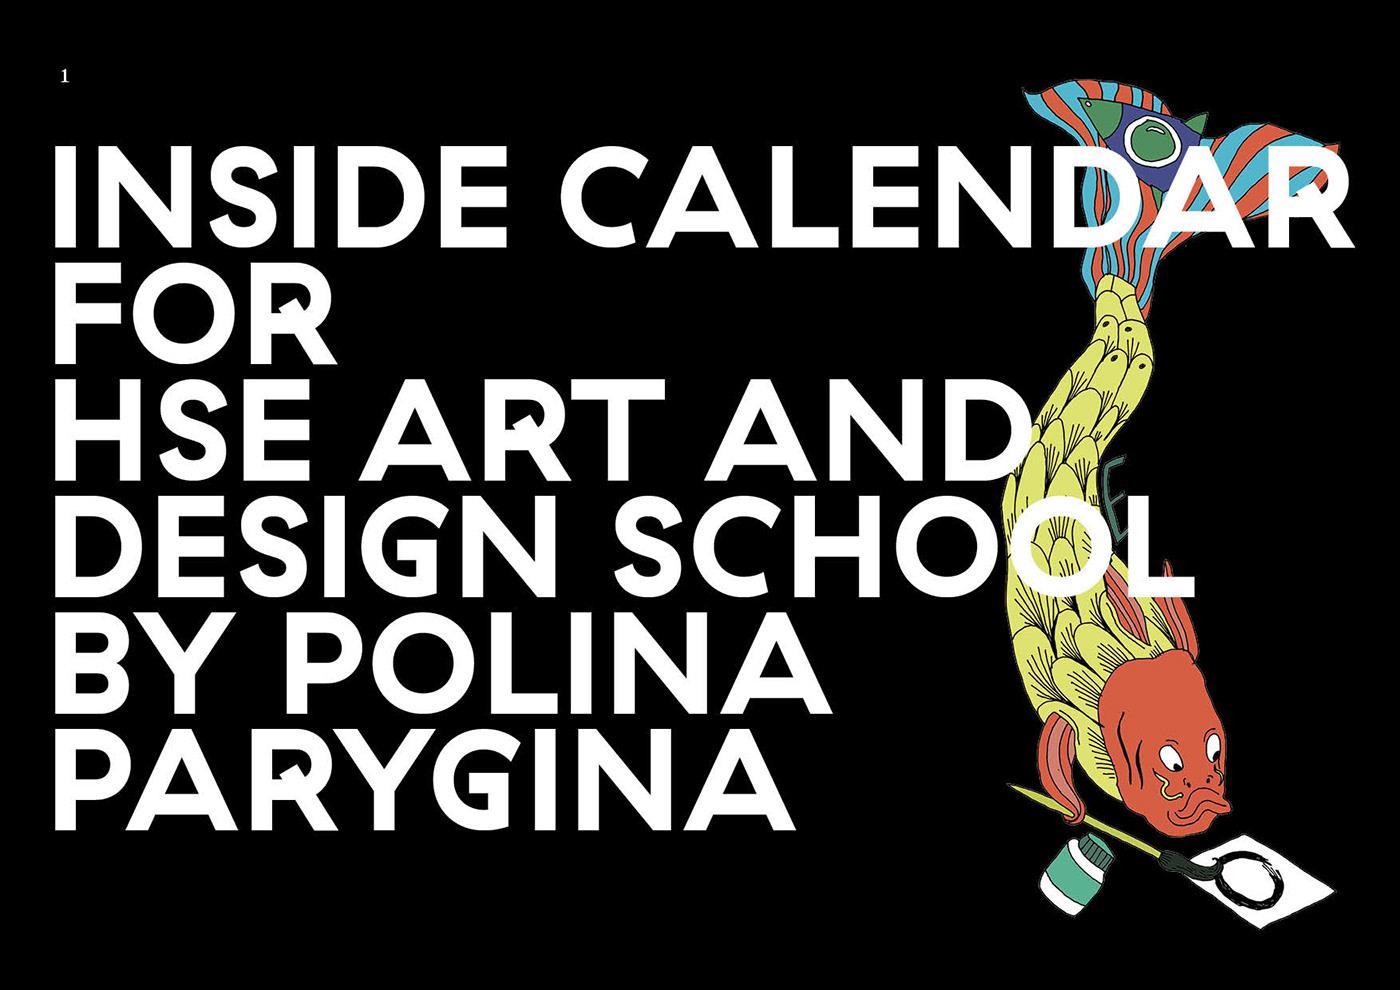 Inside Calendar For Hse Art And Design School 2018 On Behance